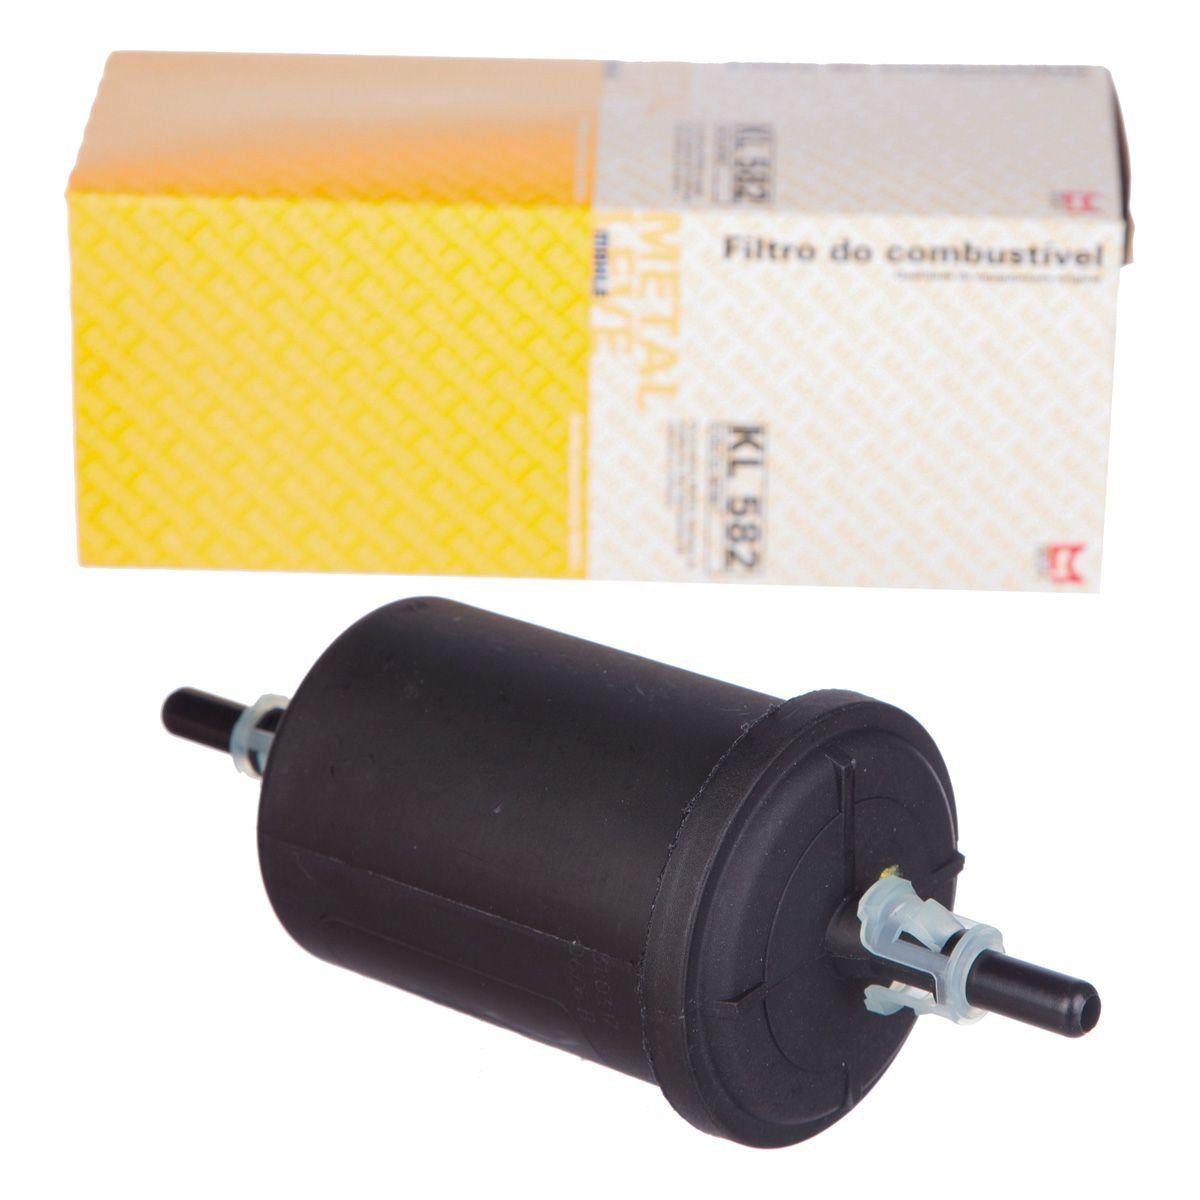 Filtro combustivel flex - Agile de 2010 a 2014